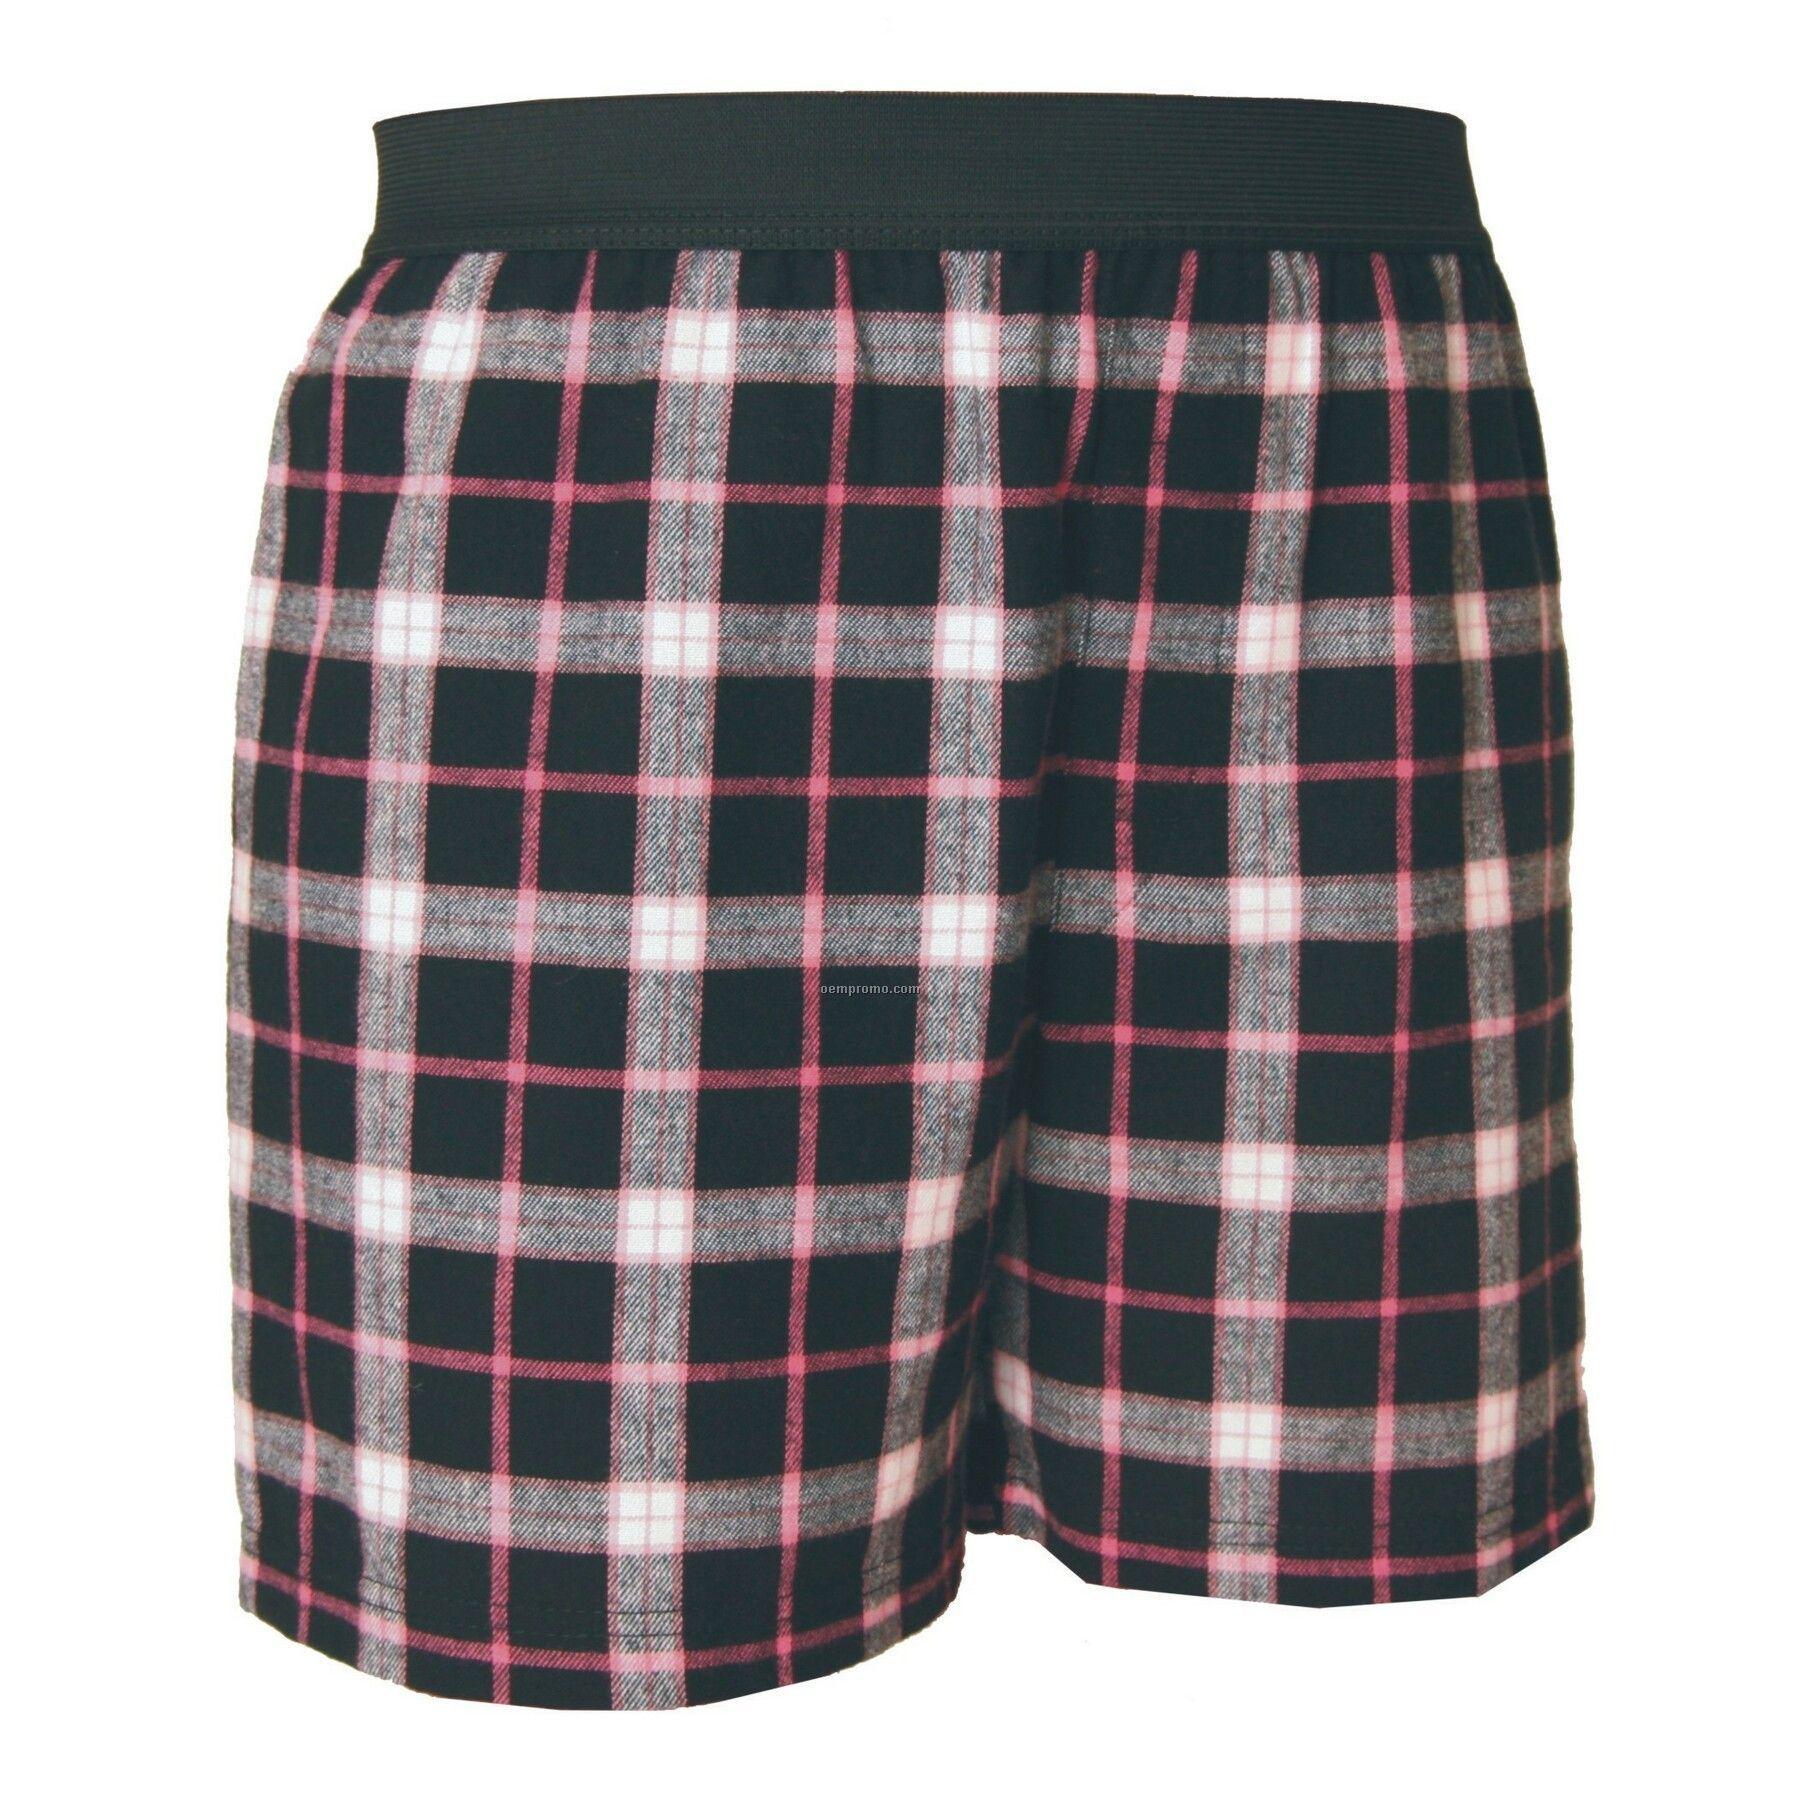 Adult Black/Pink Plaid Classic Boxer Shorts